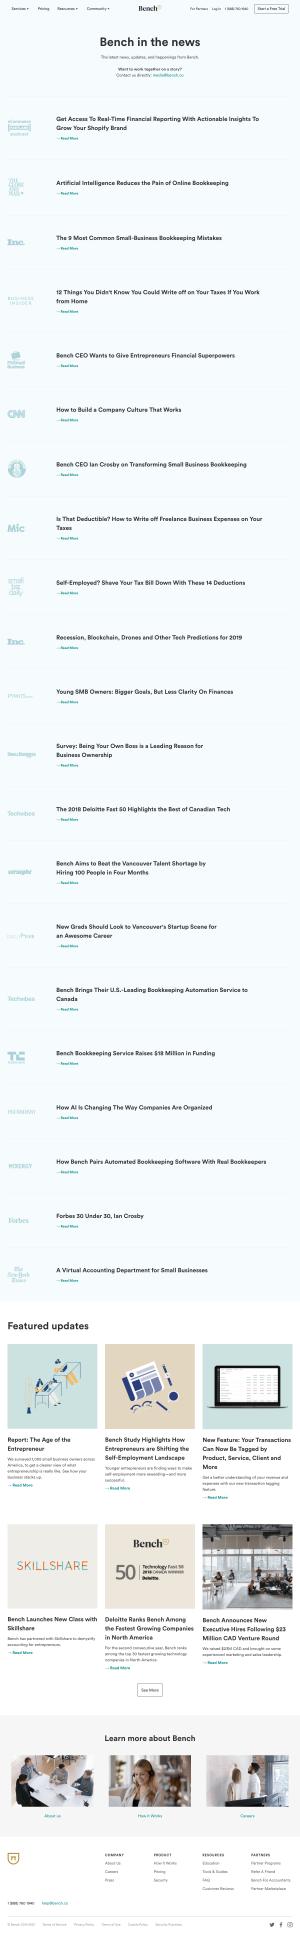 Bench – Newsroom